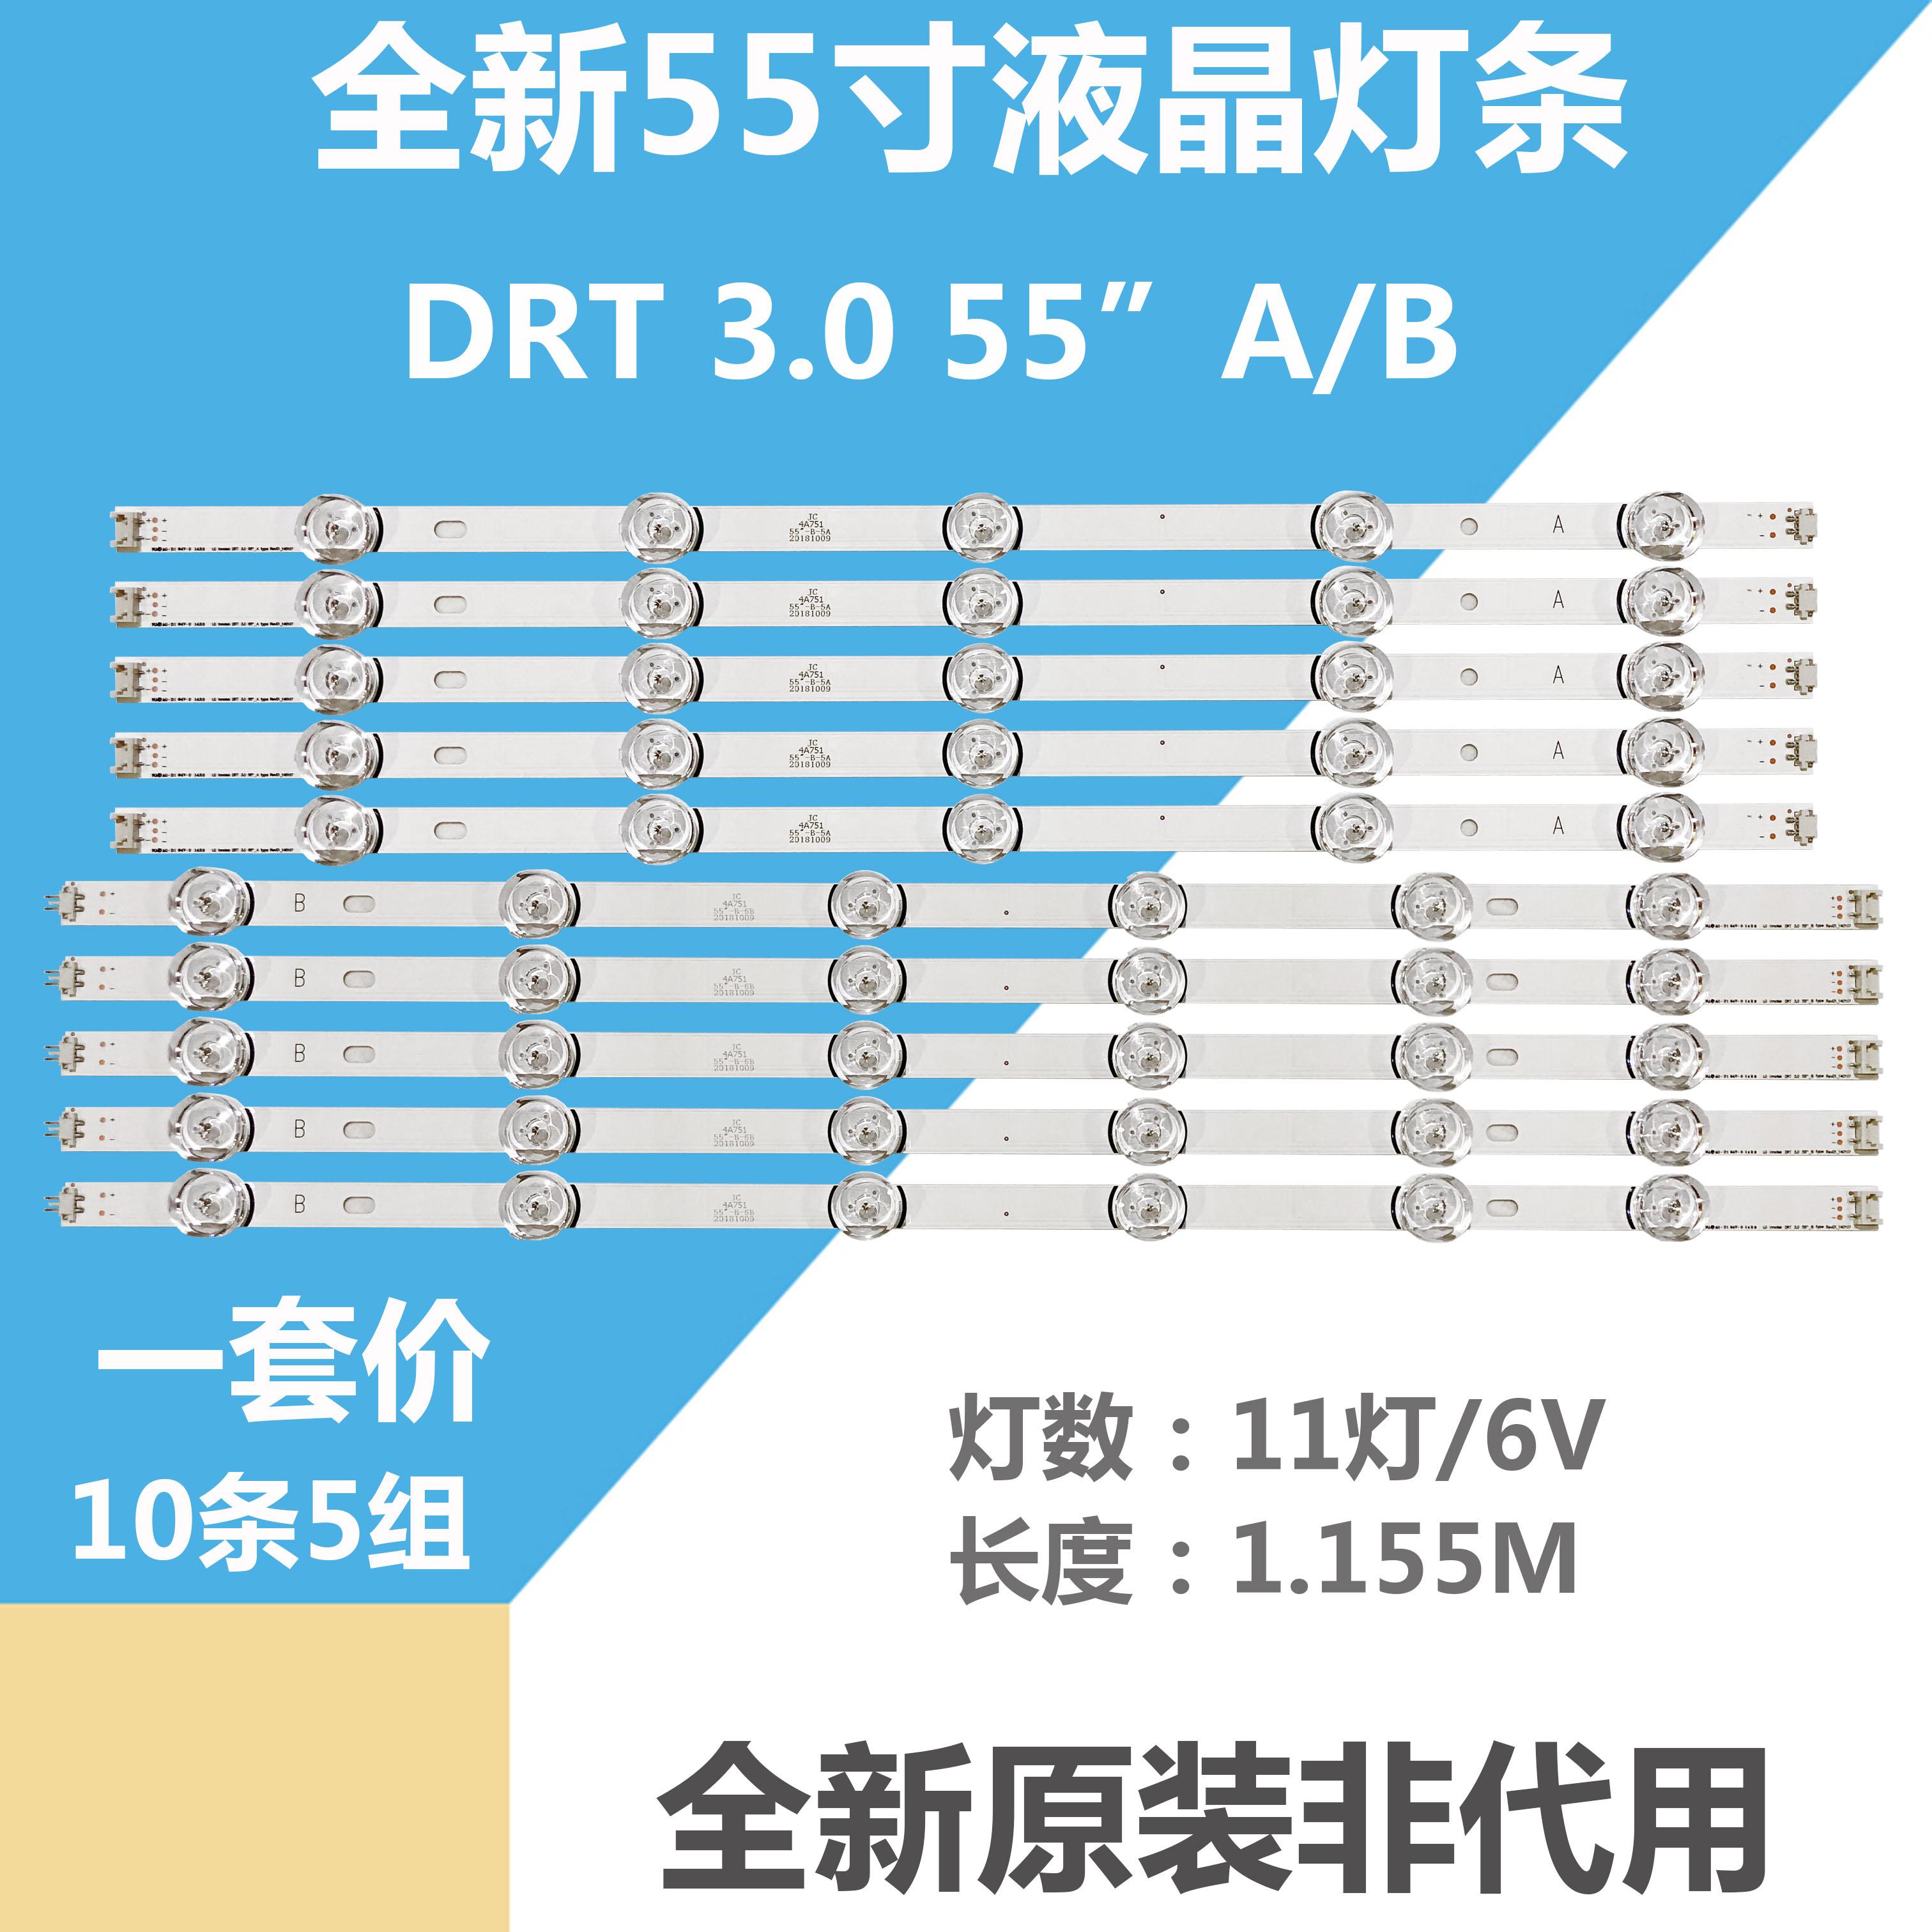 LED Backlight strip For Innotek DRT 3 0 55 55LB561V LG55LF5950 6916L 1730A 1731 1833A 1834A